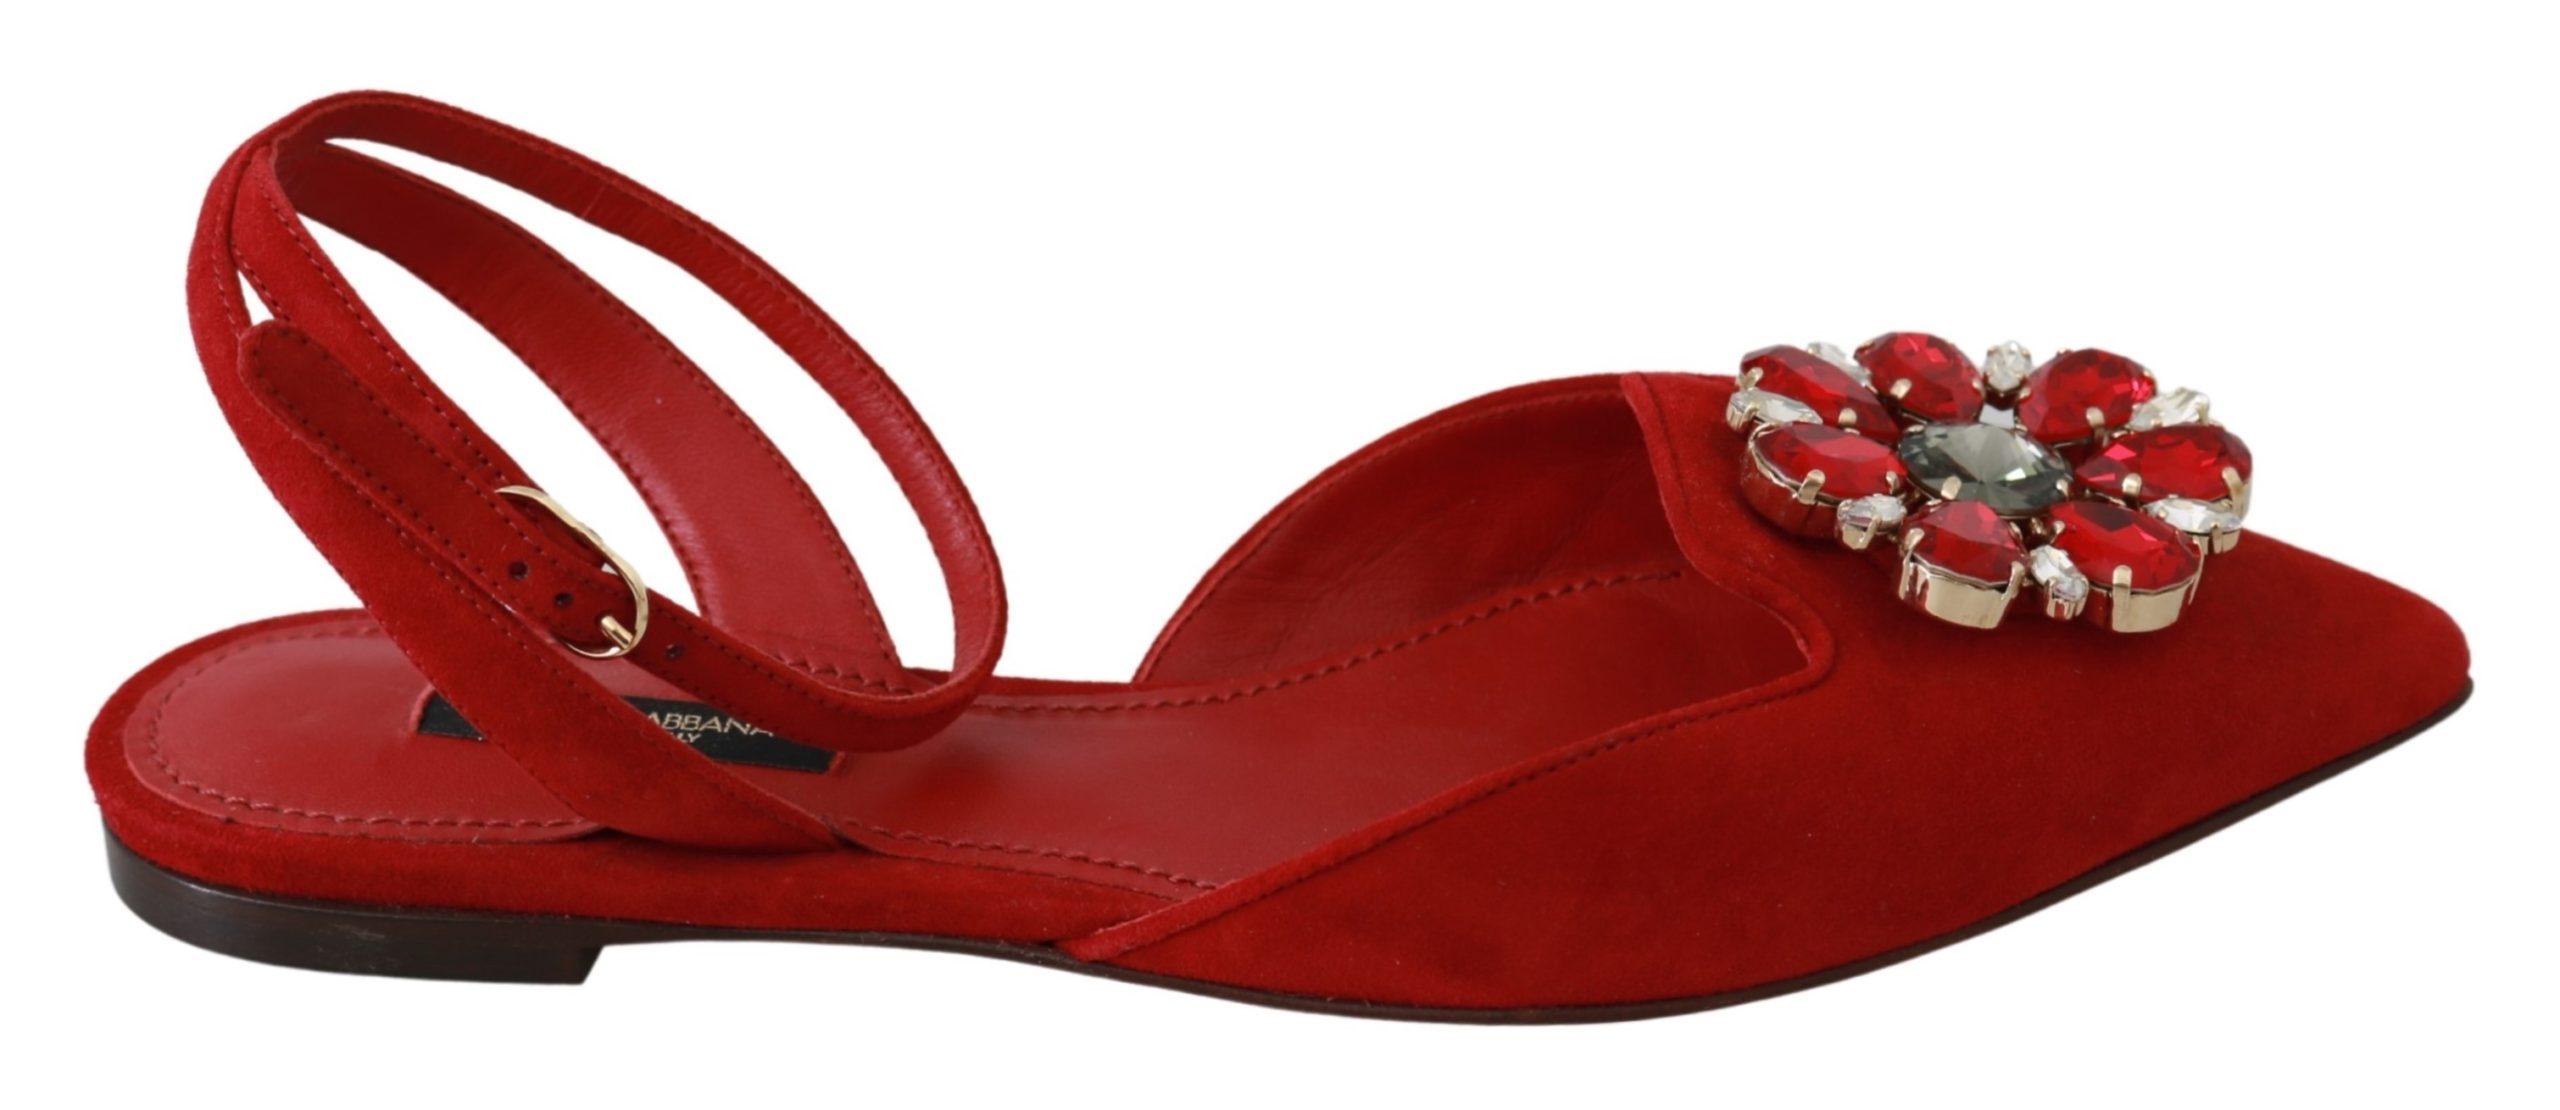 Dolce & Gabbana Women's Suede Leather Crystal Sandal Red LA6488 - EU35/US4.5